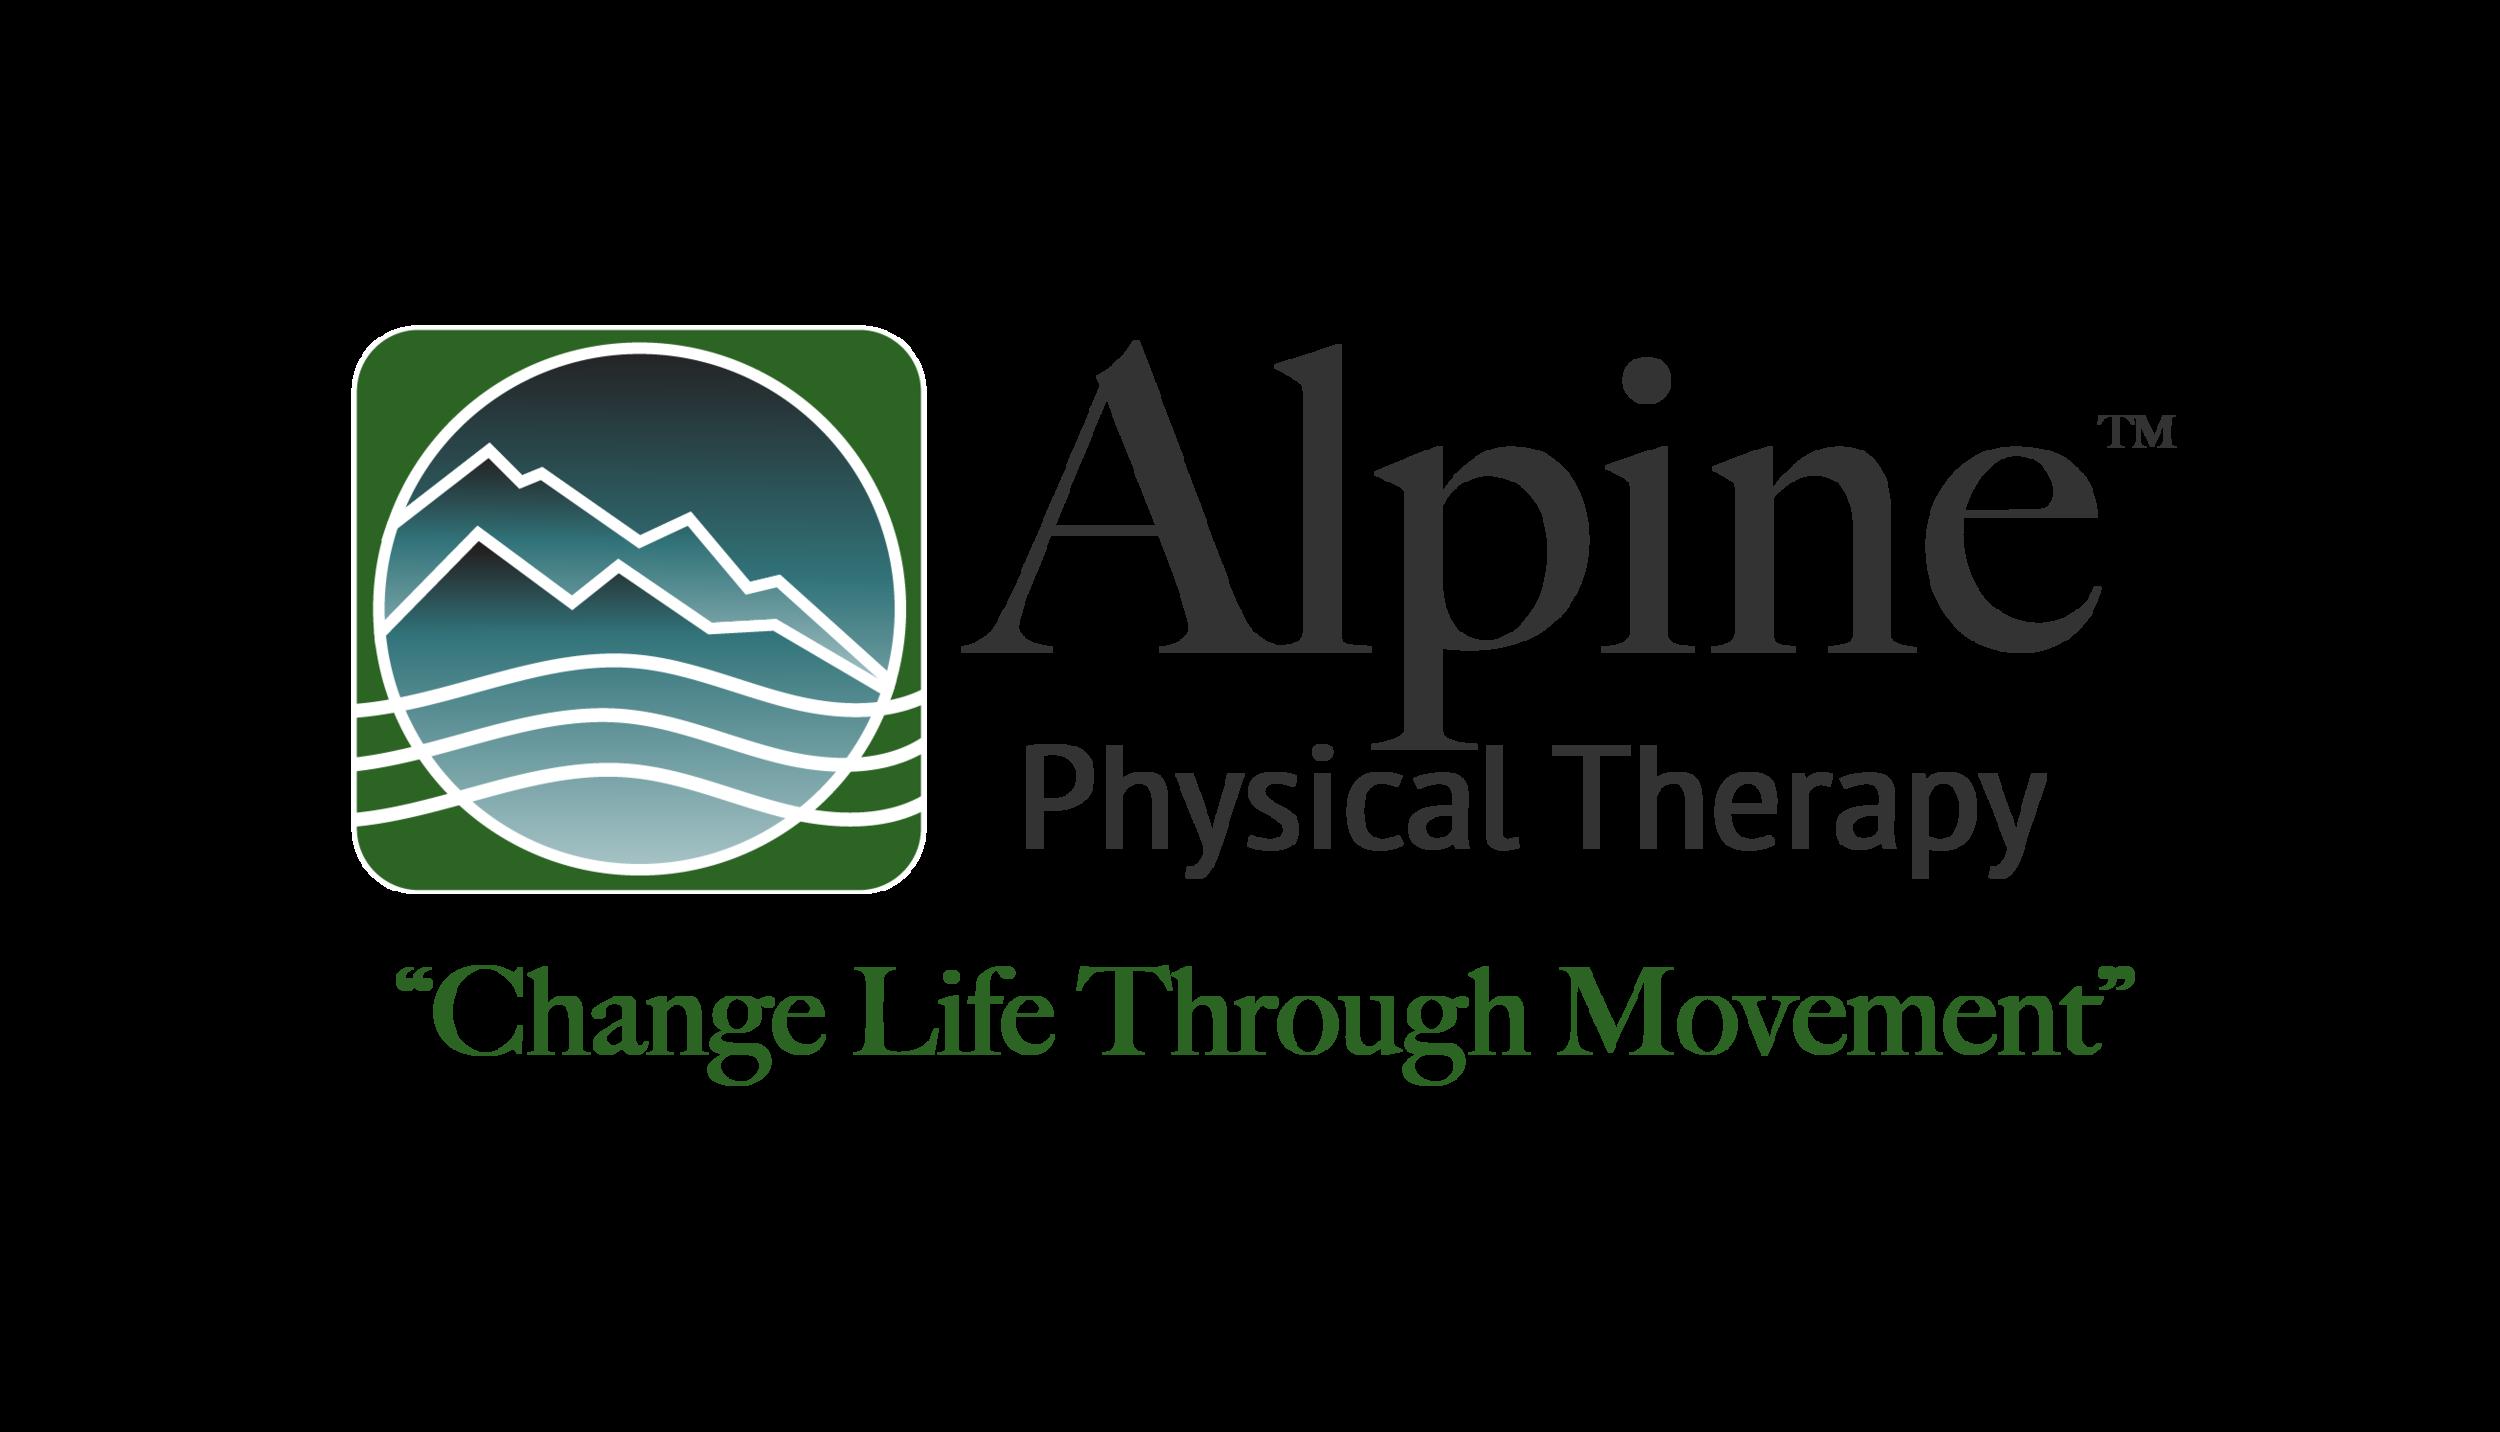 Alpine %22change life through movement%22 logo-01.png